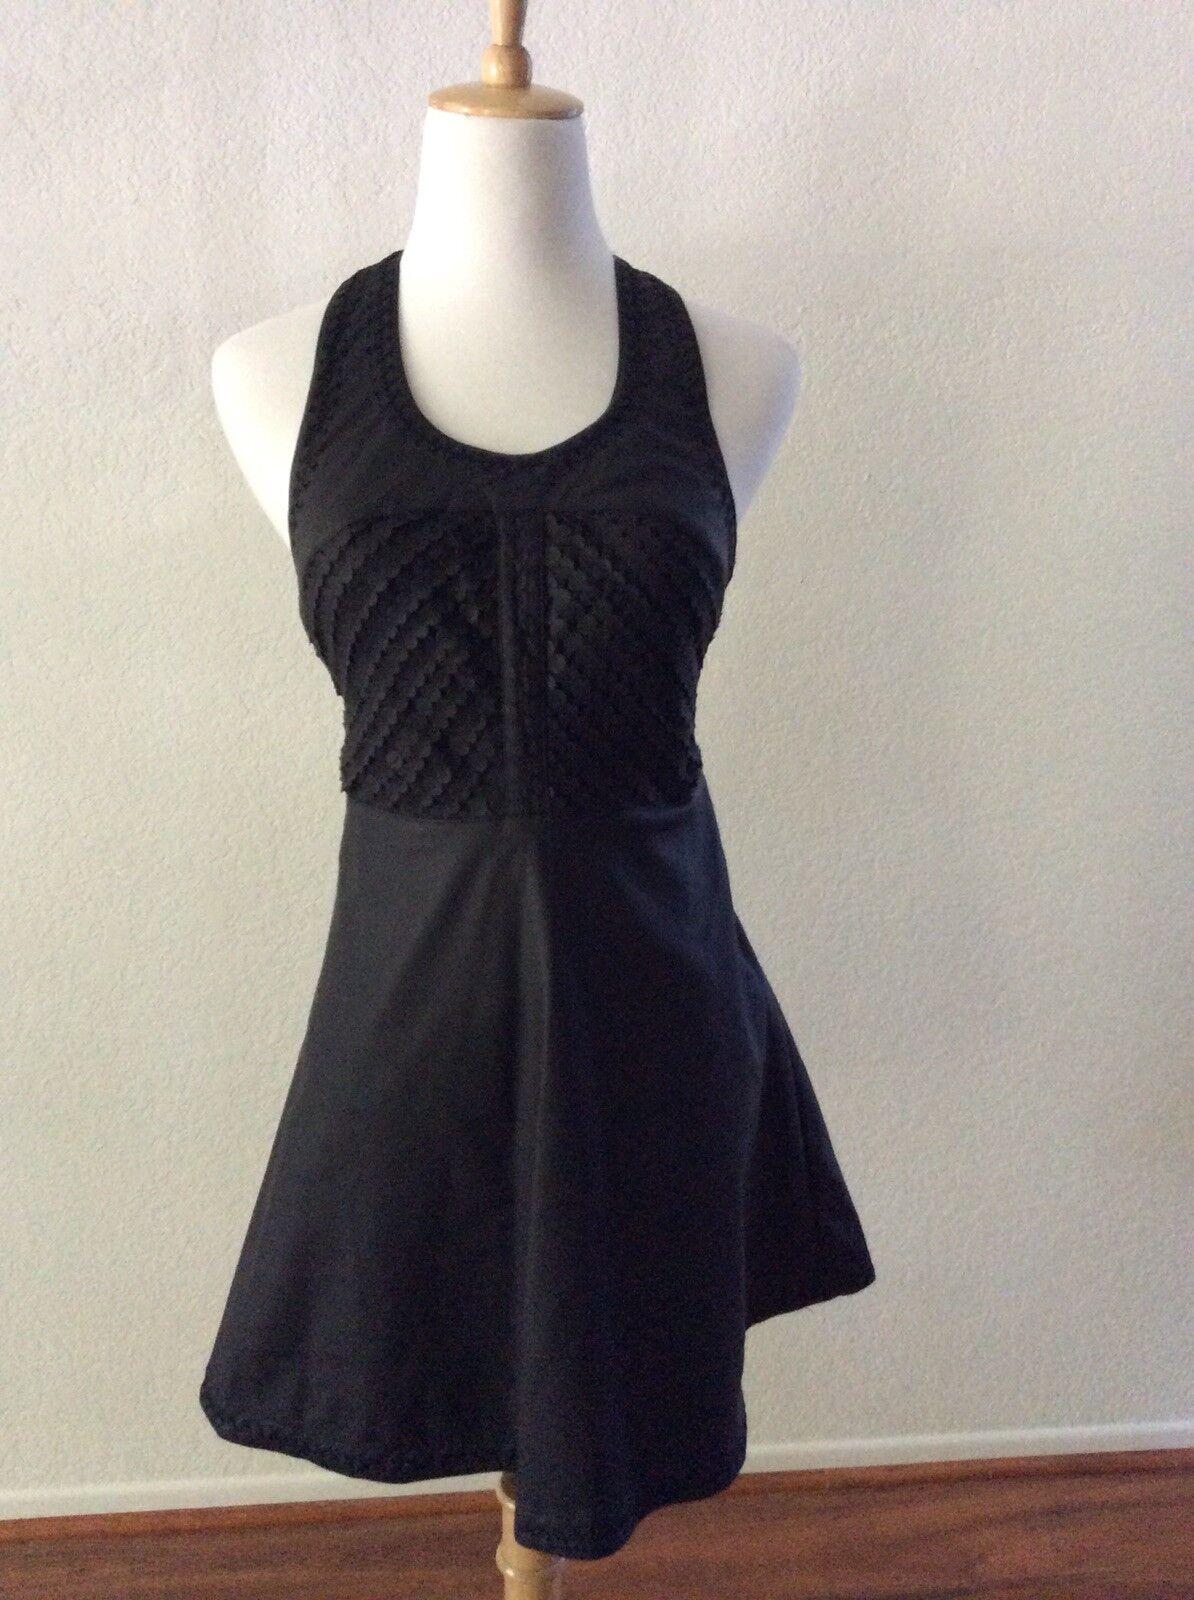 NWT Free People schwarz Vegan Pleather Racerback Sleeveless Cutout Dress Größe 0 XS